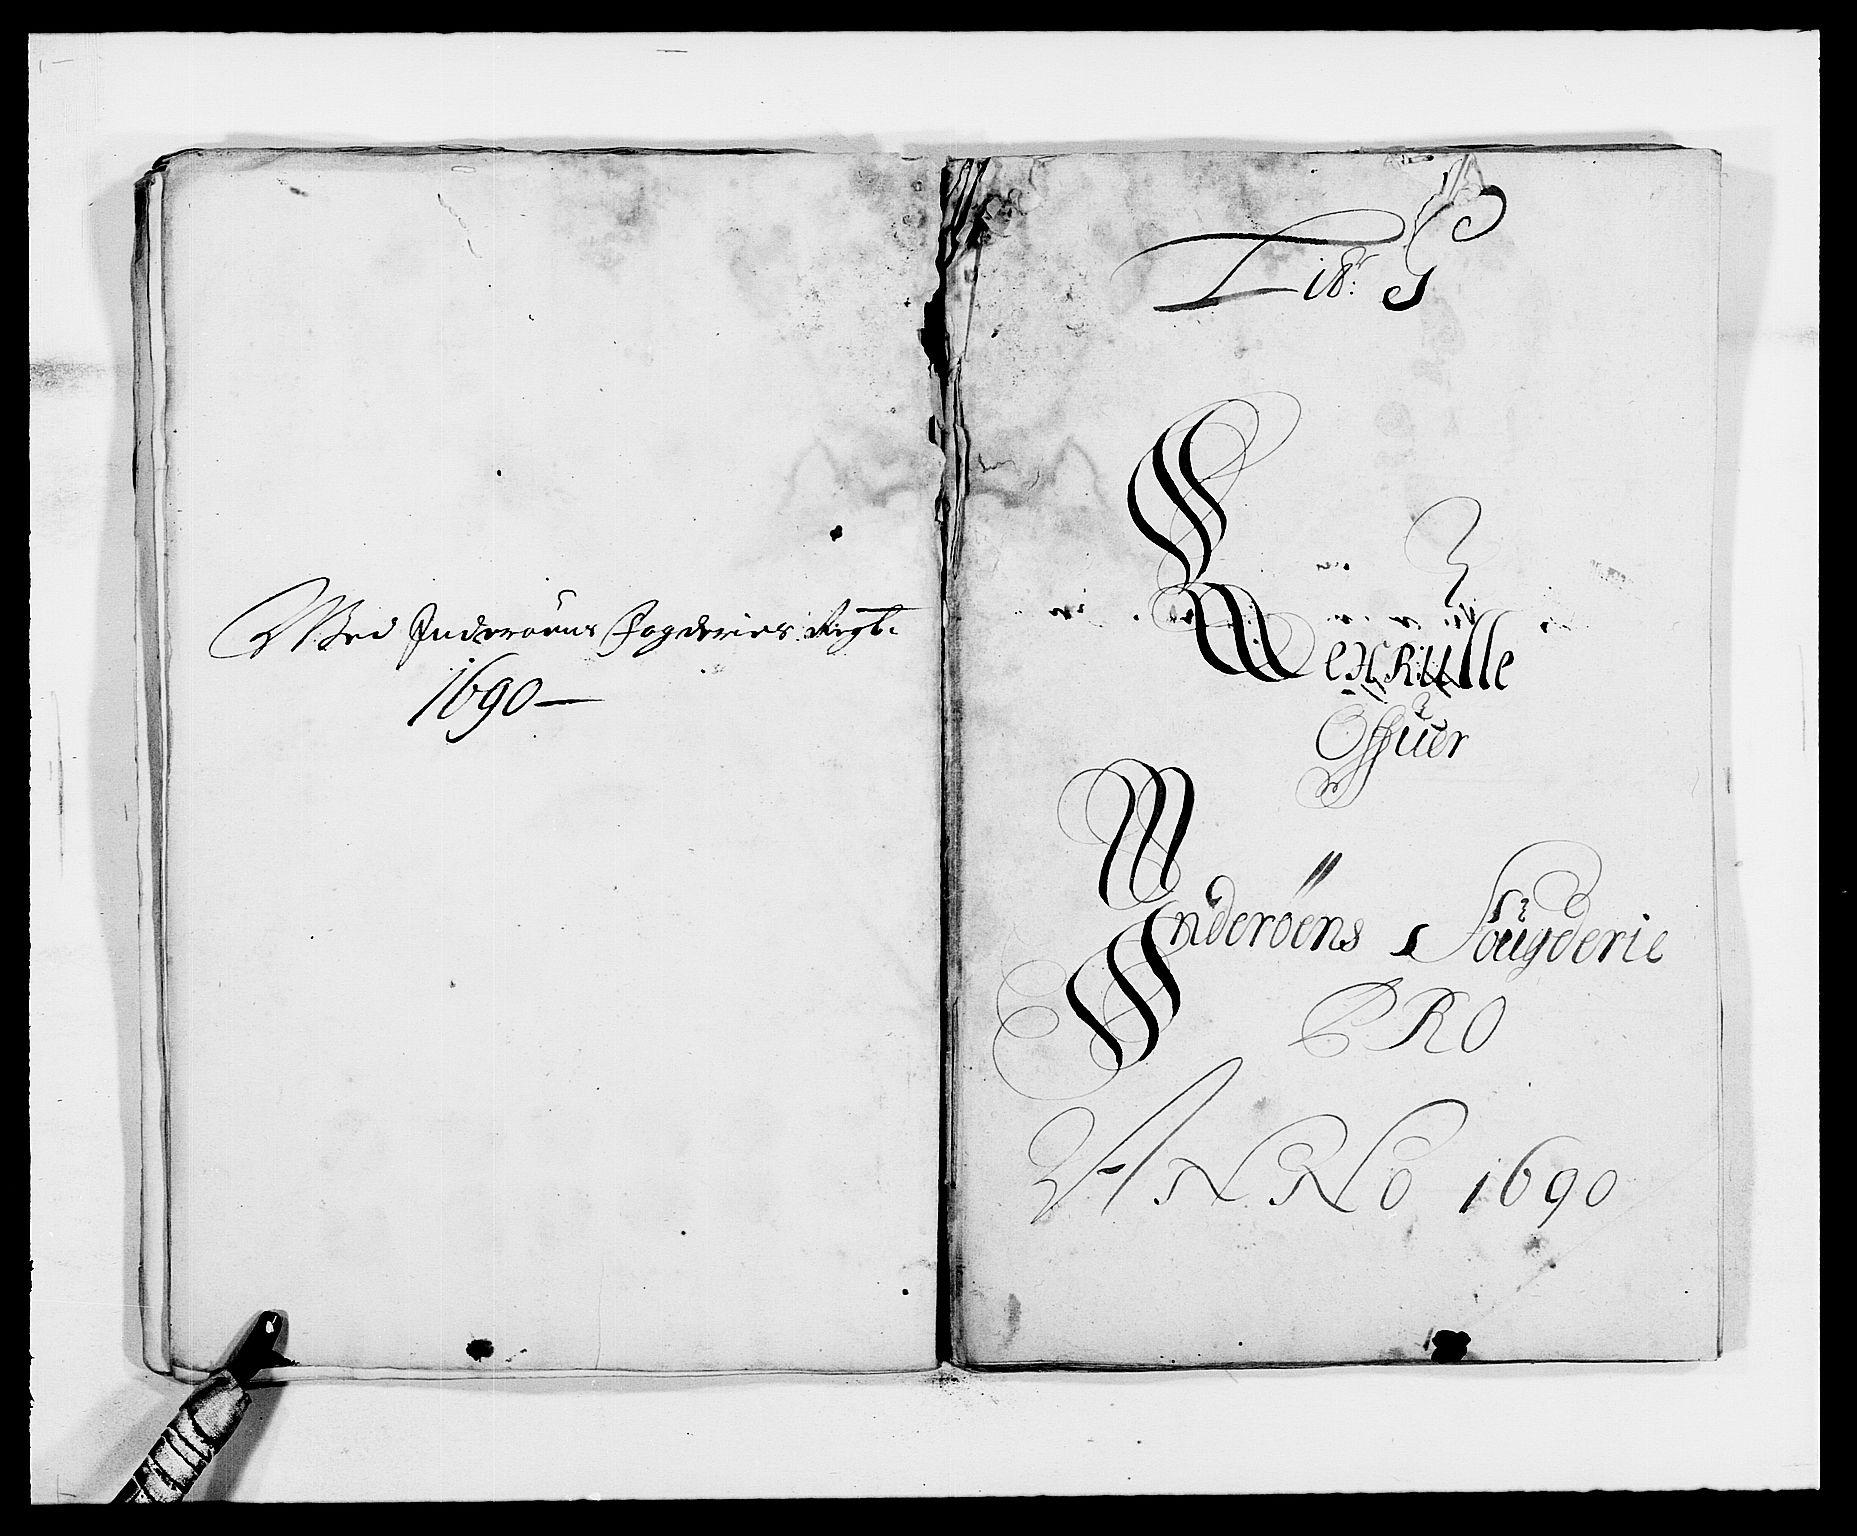 RA, Rentekammeret inntil 1814, Reviderte regnskaper, Fogderegnskap, R63/L4307: Fogderegnskap Inderøy, 1690-1691, s. 91